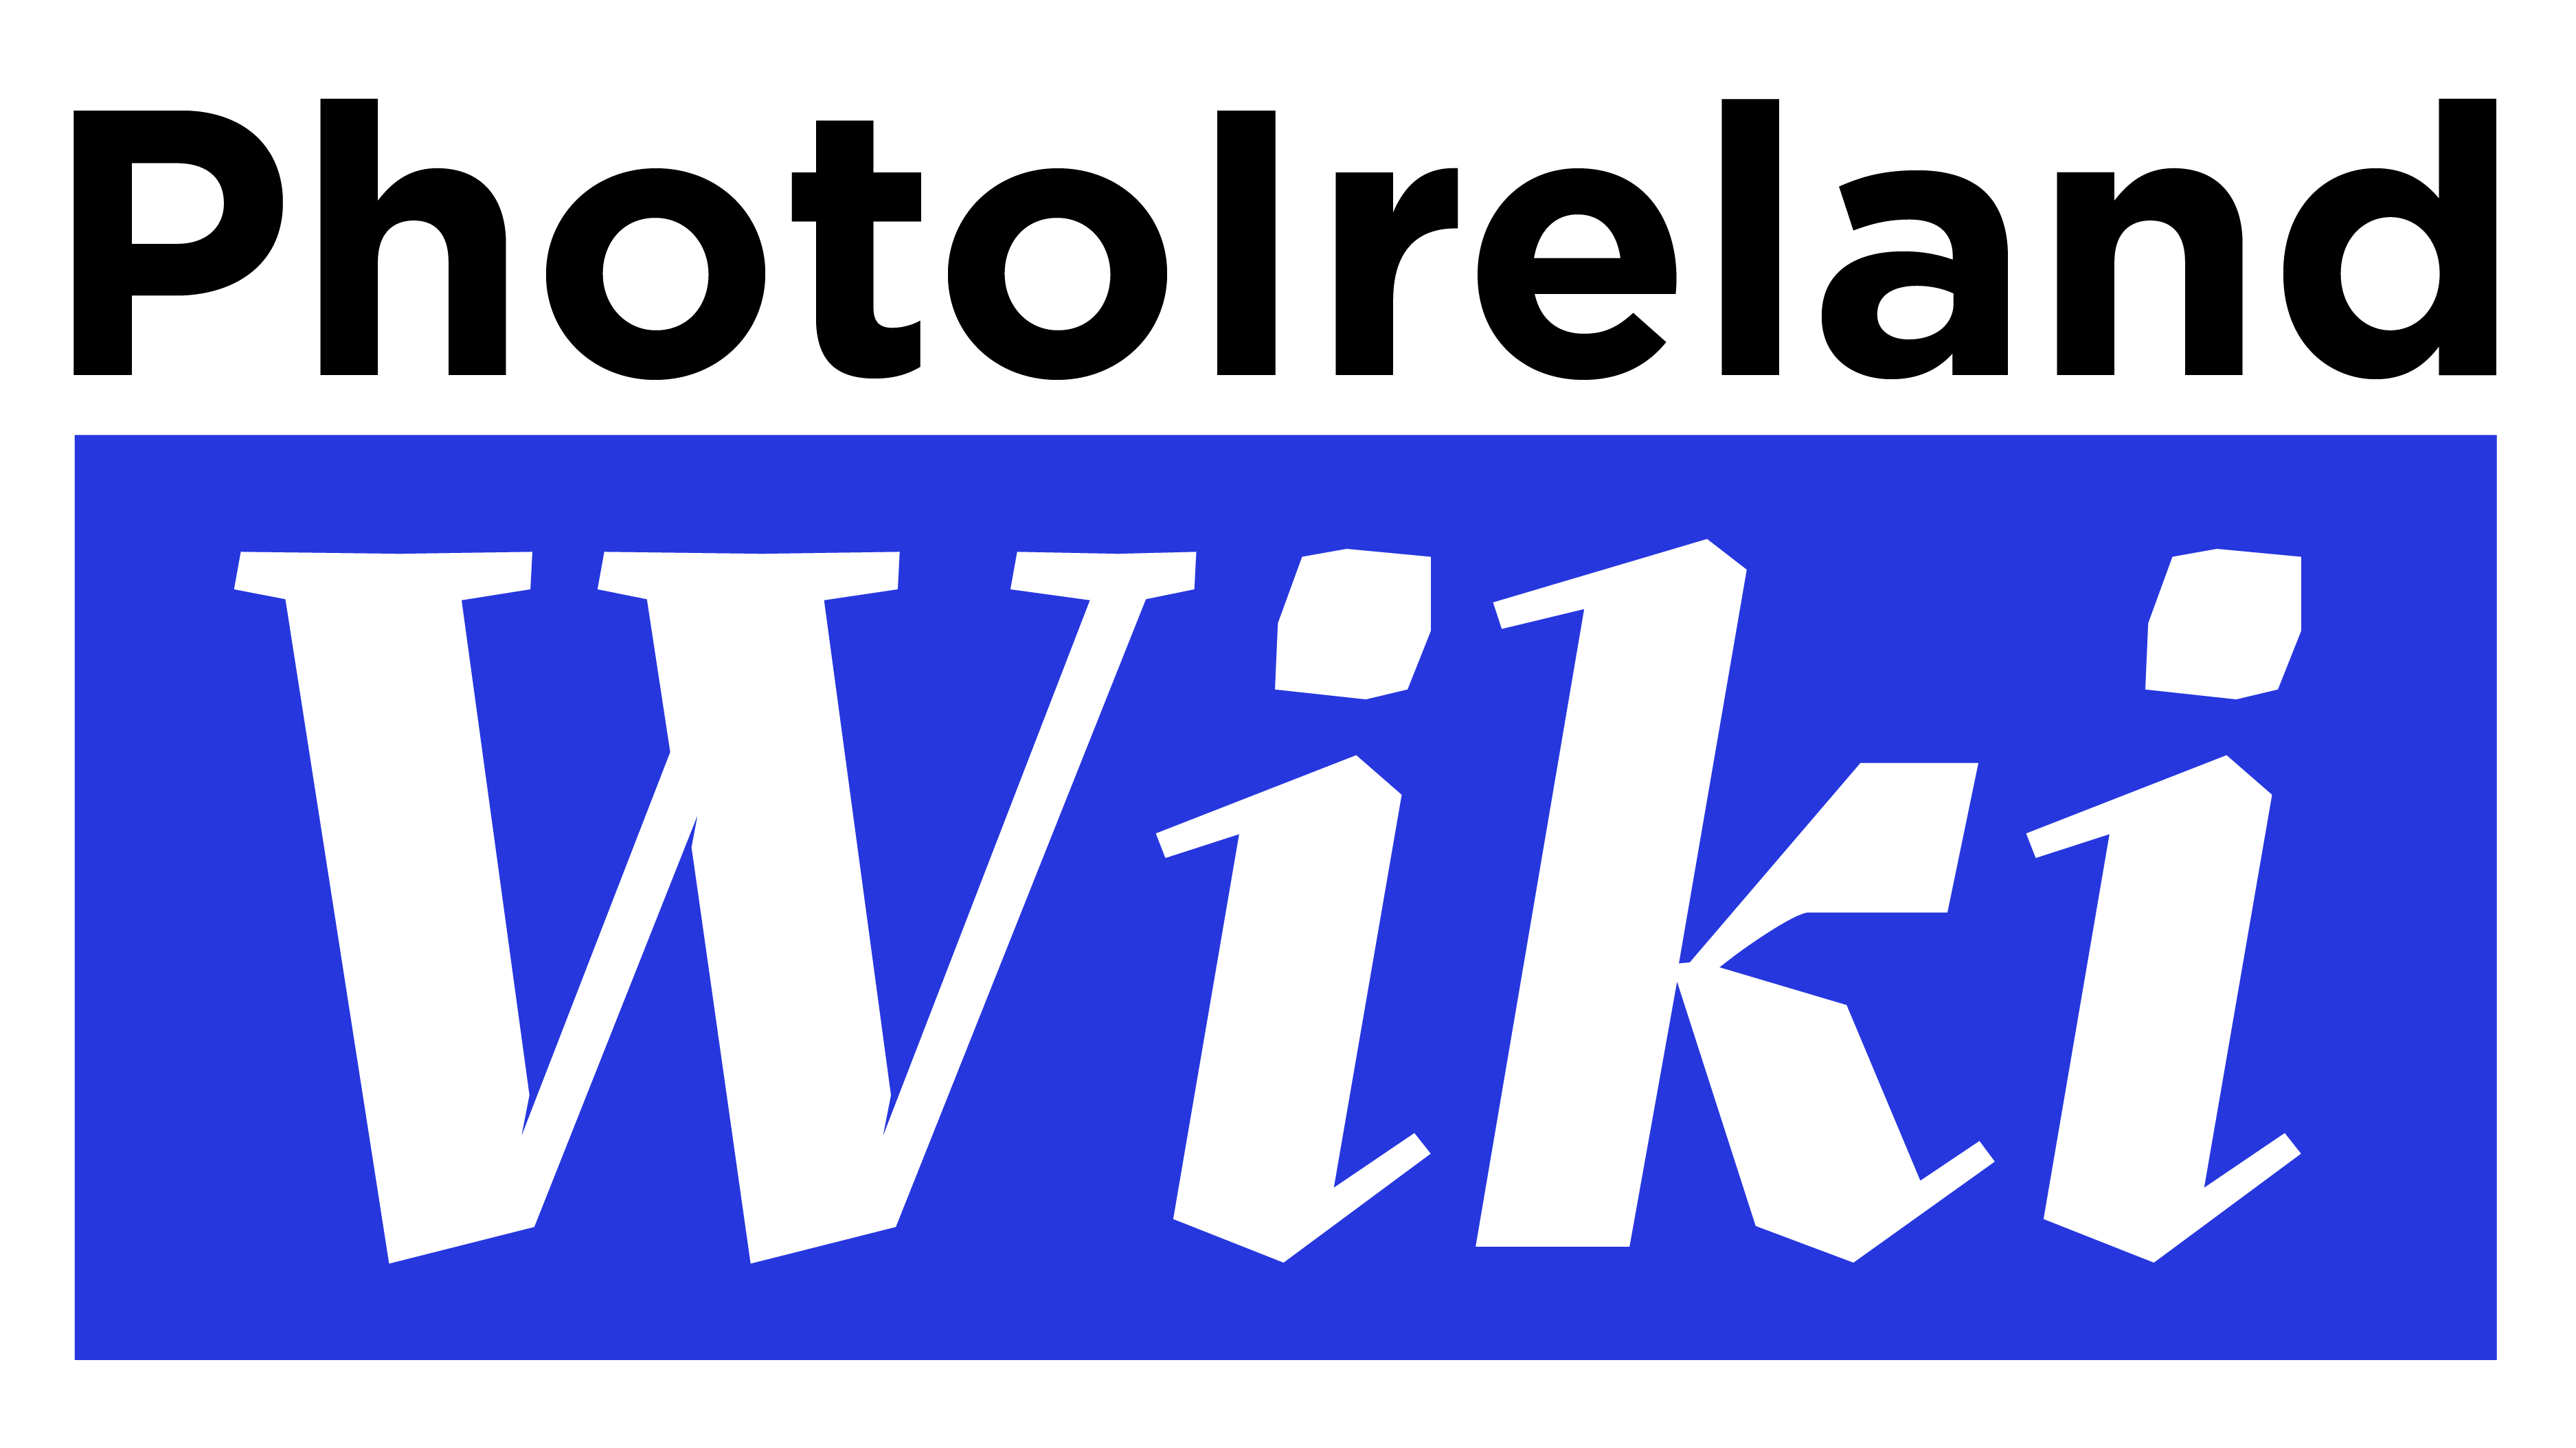 PhotoIreland Wiki